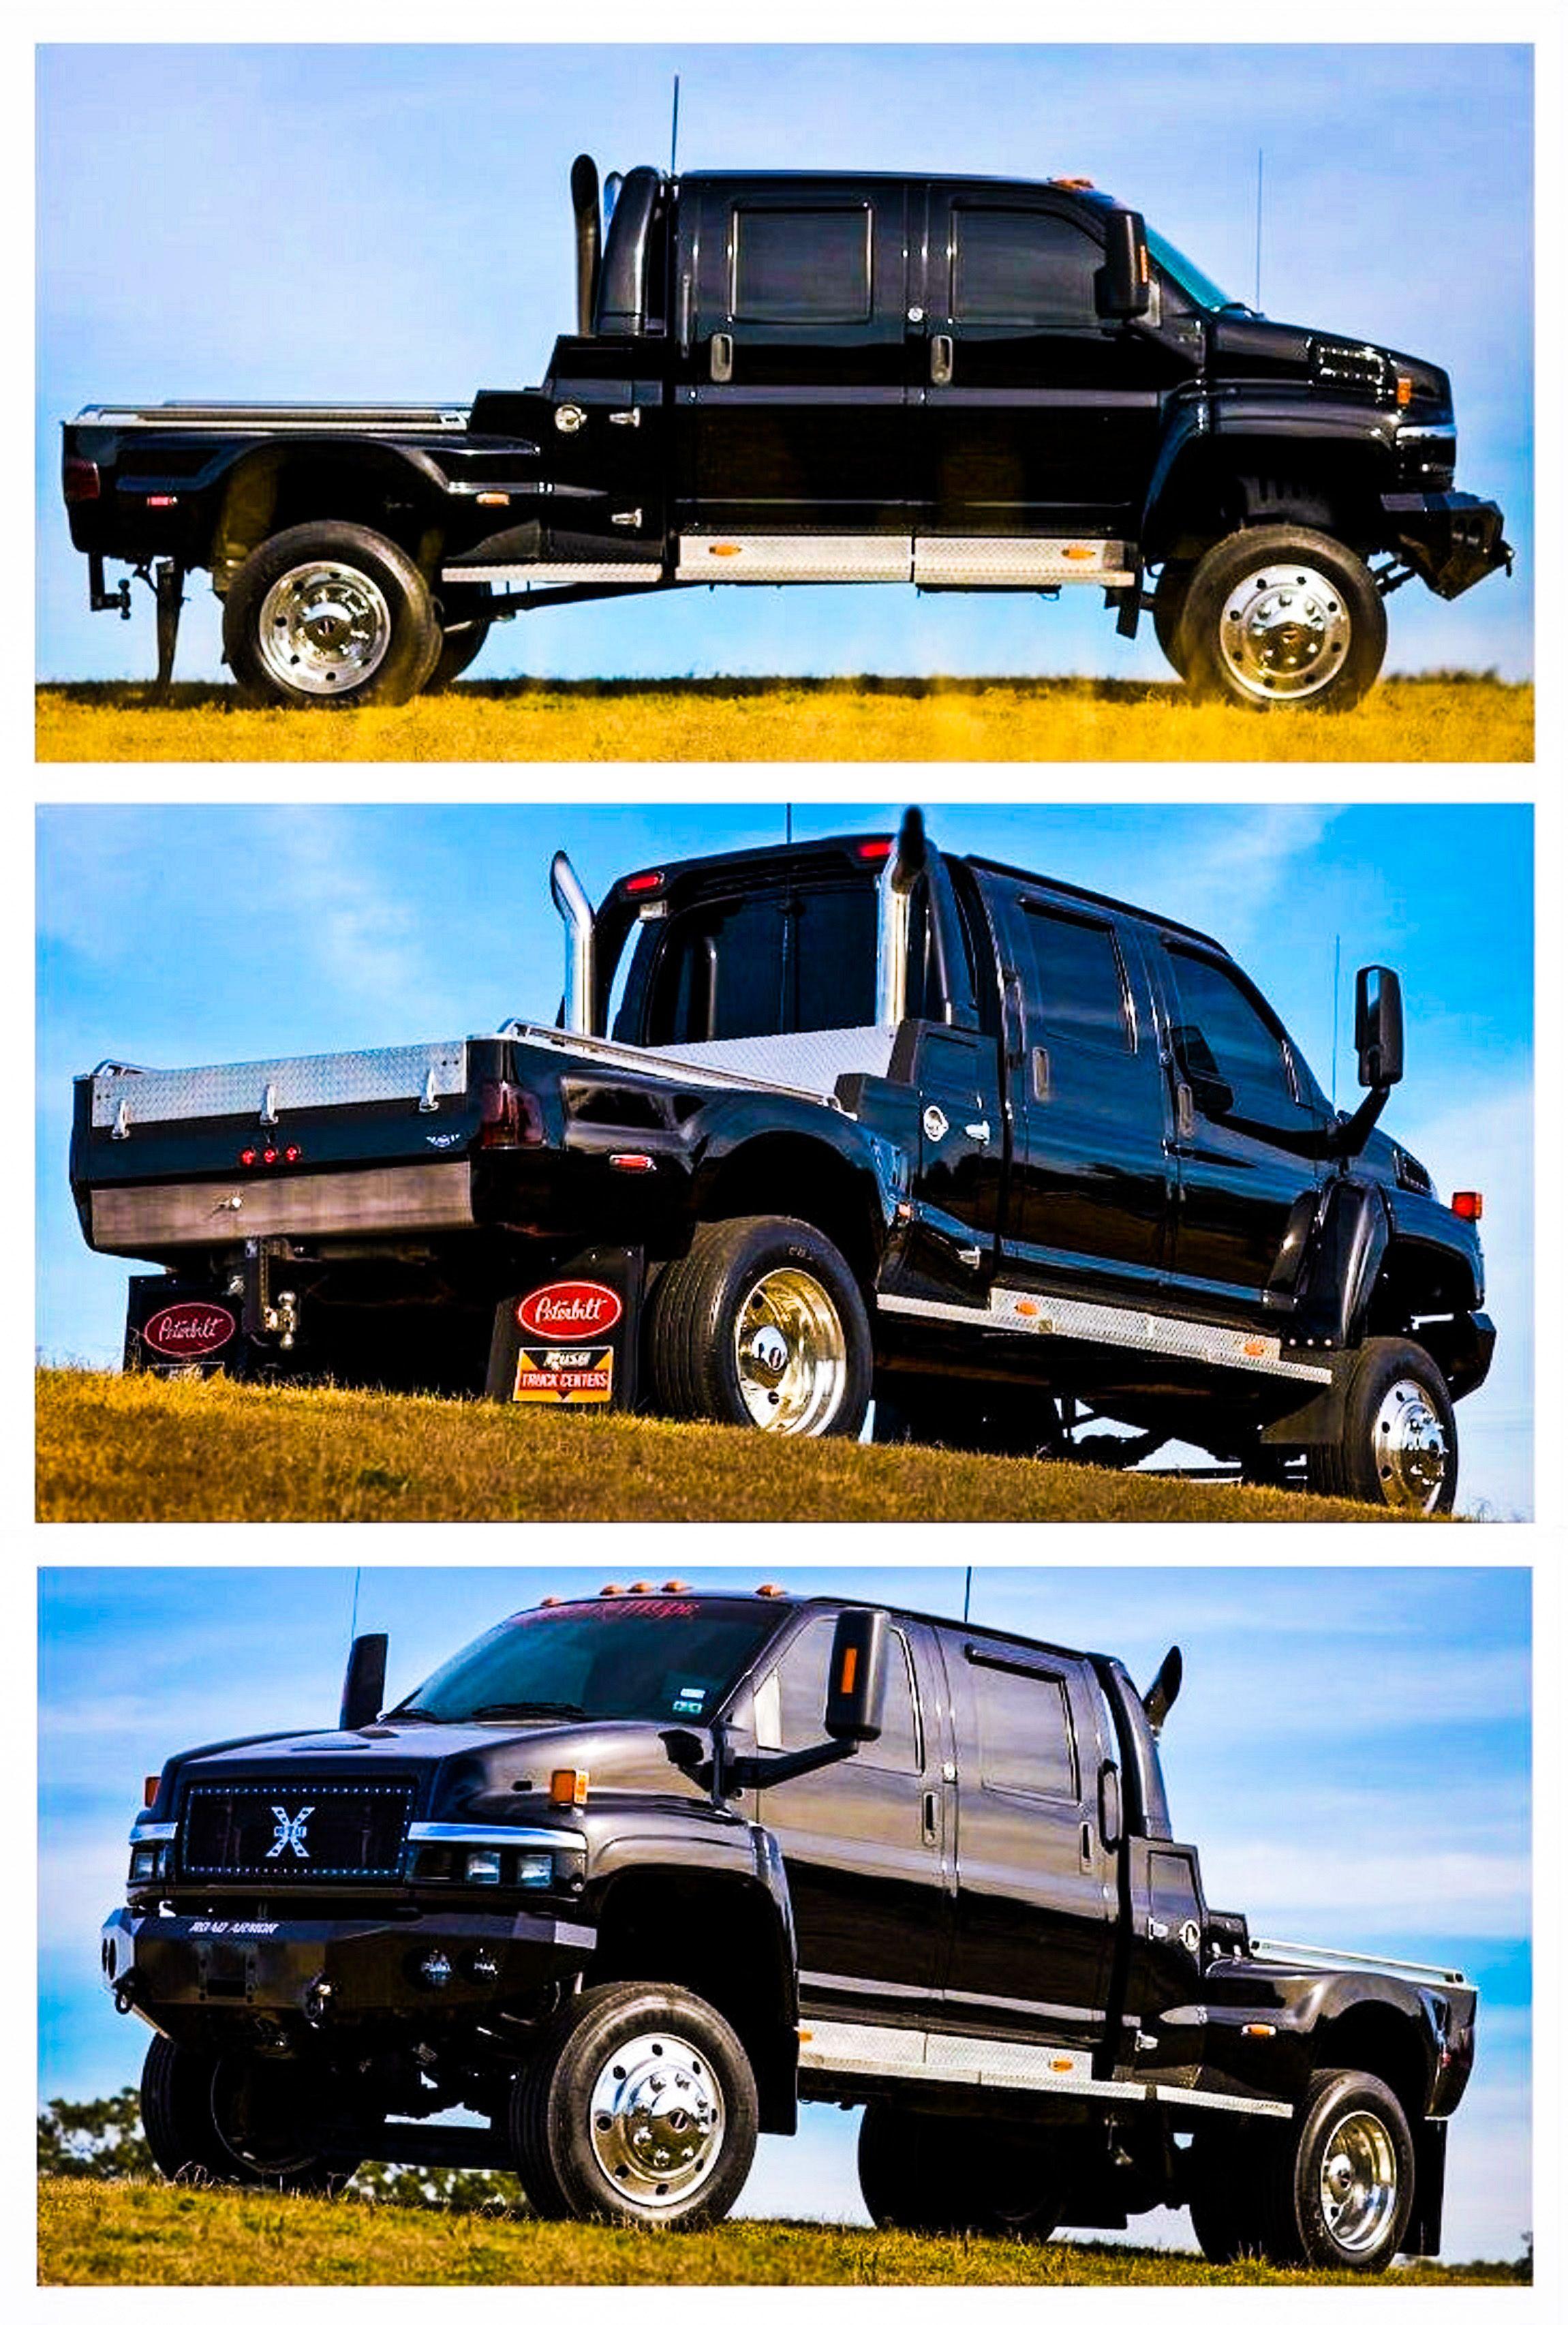 2004 gmc c4500 topkick extreme ironhide truck http tenwheel com